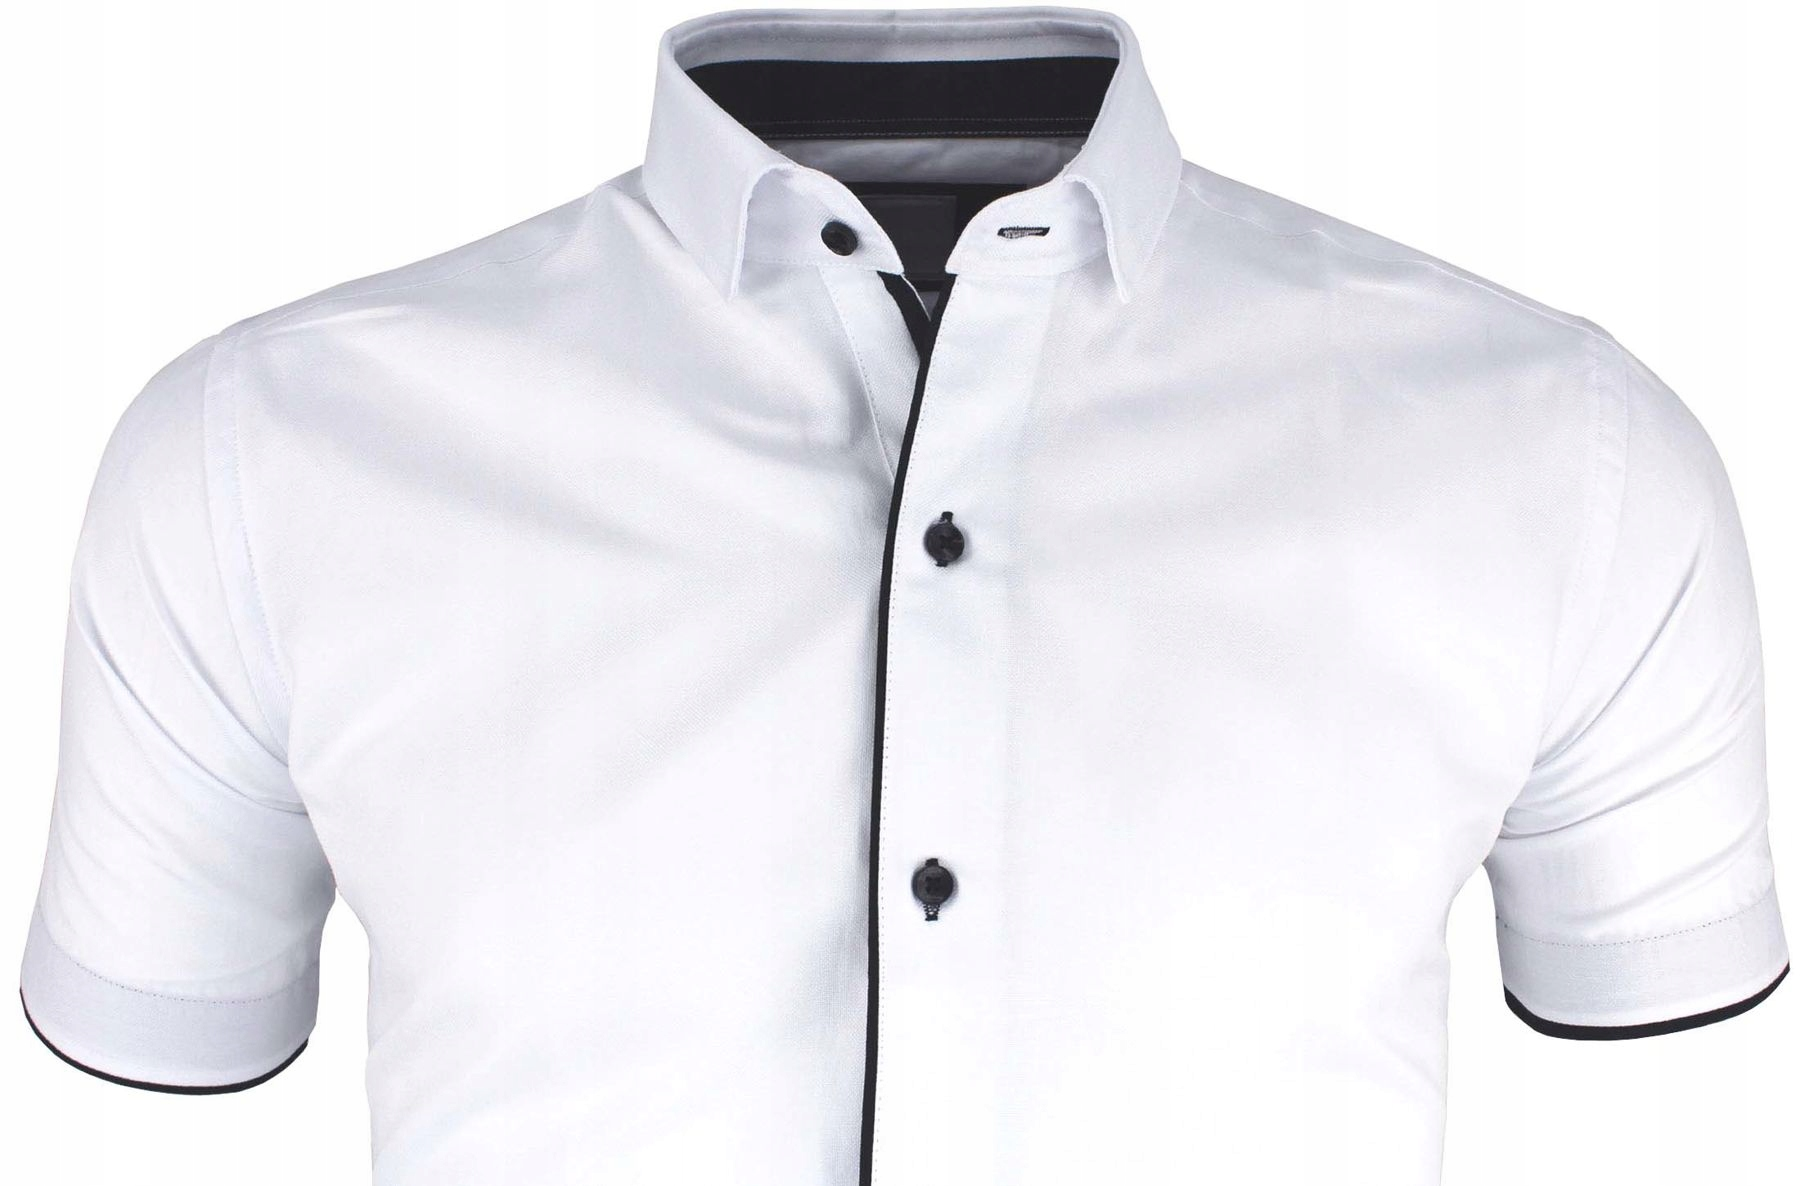 Biała Koszula Męska Granatowe wst do garnituru 3XL  i9AgK